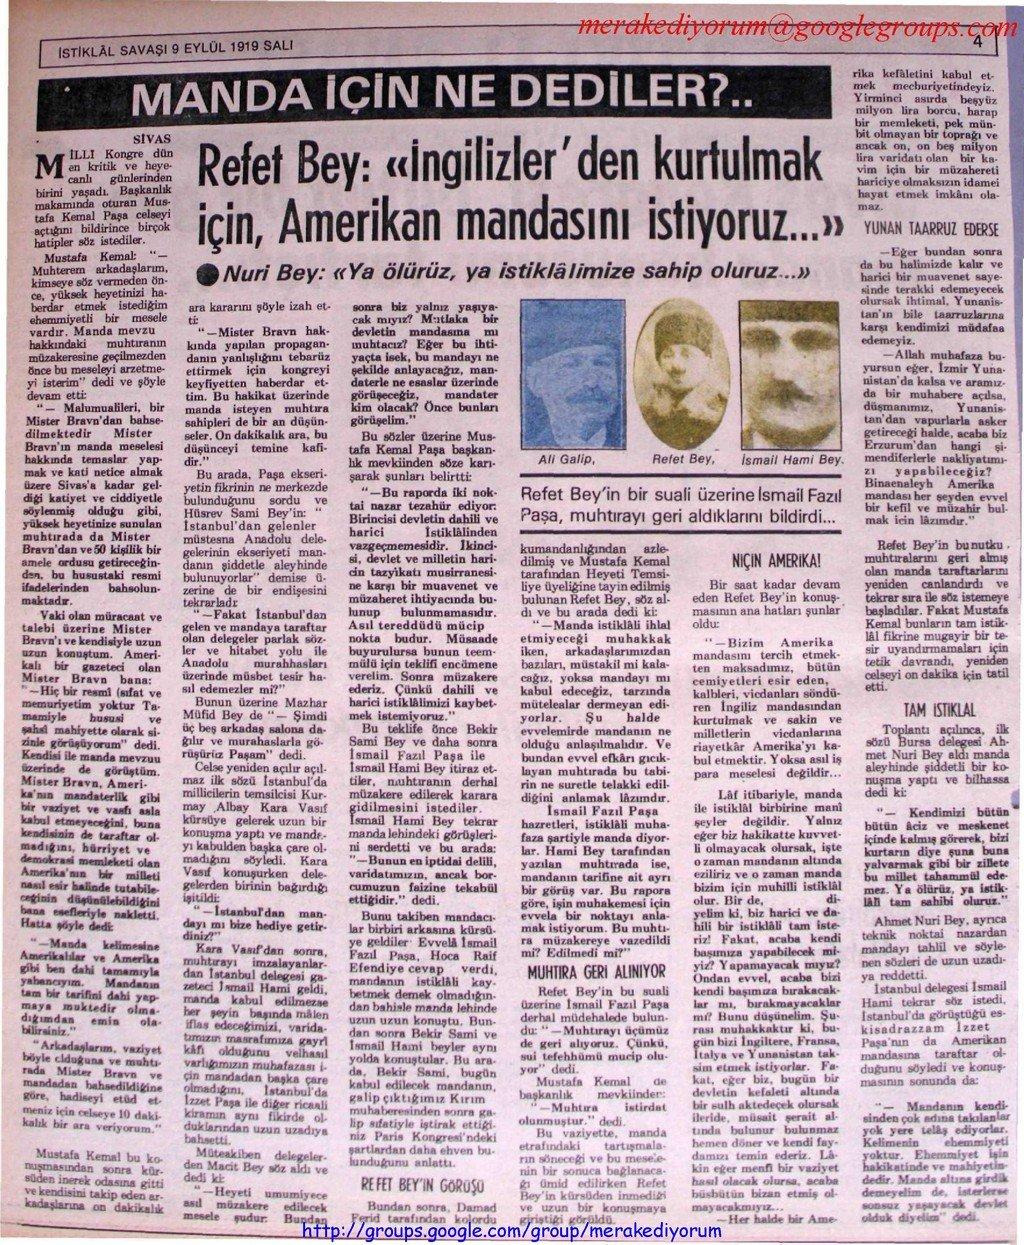 istiklal savaşı gazetesi - 9 eylül 1919